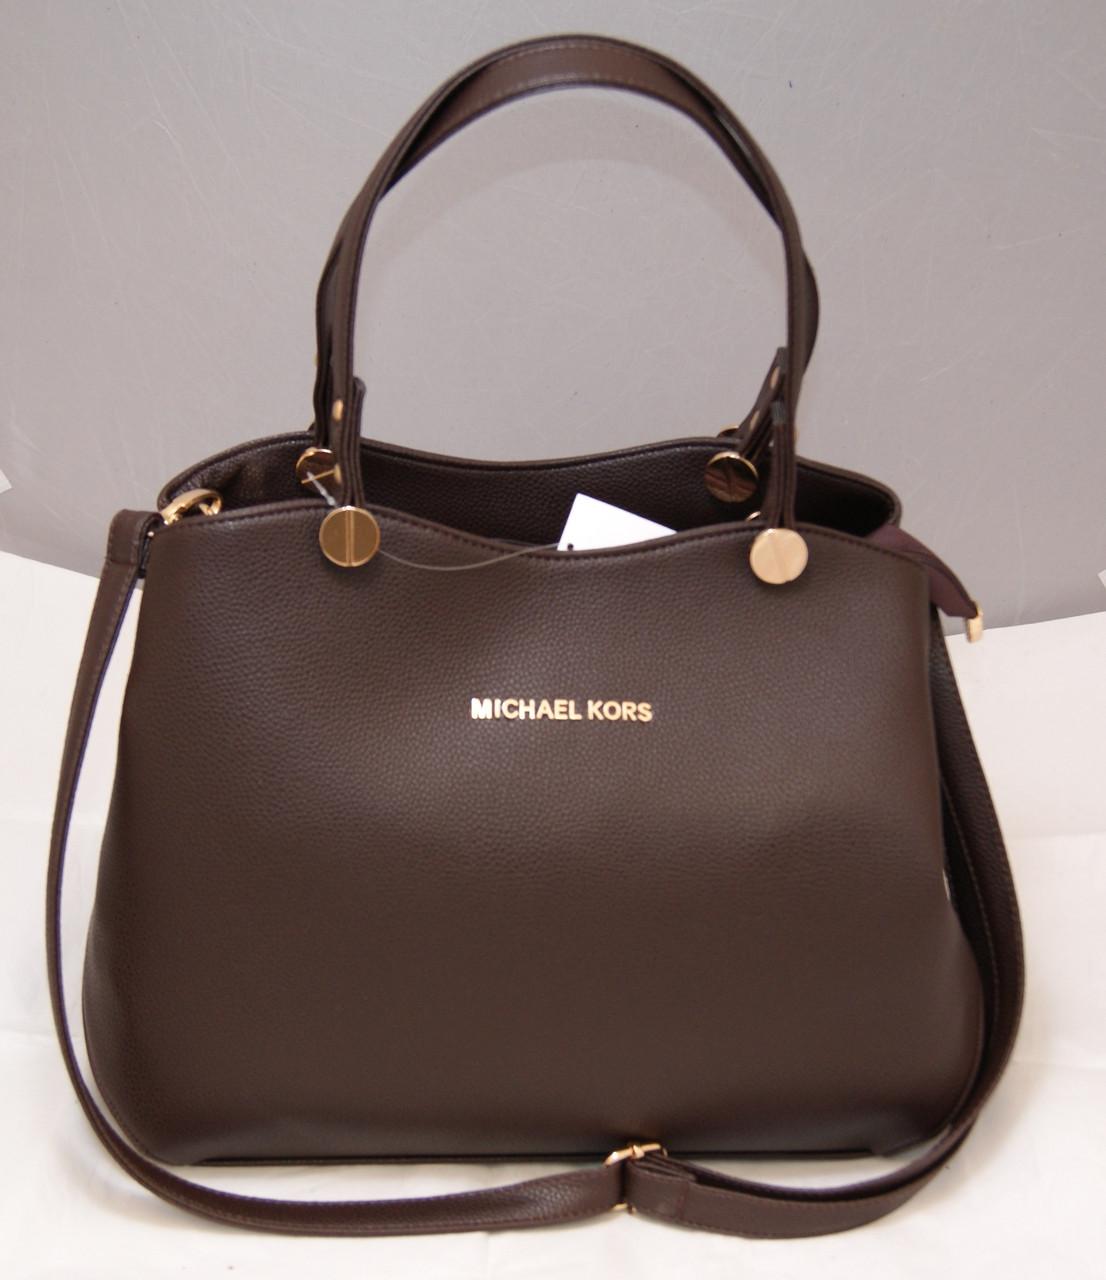 ddb9c7d38495 Женская сумка Michael Kors, цвет коричневый шоколад Майкл Корс MK -  Интернет-магазин